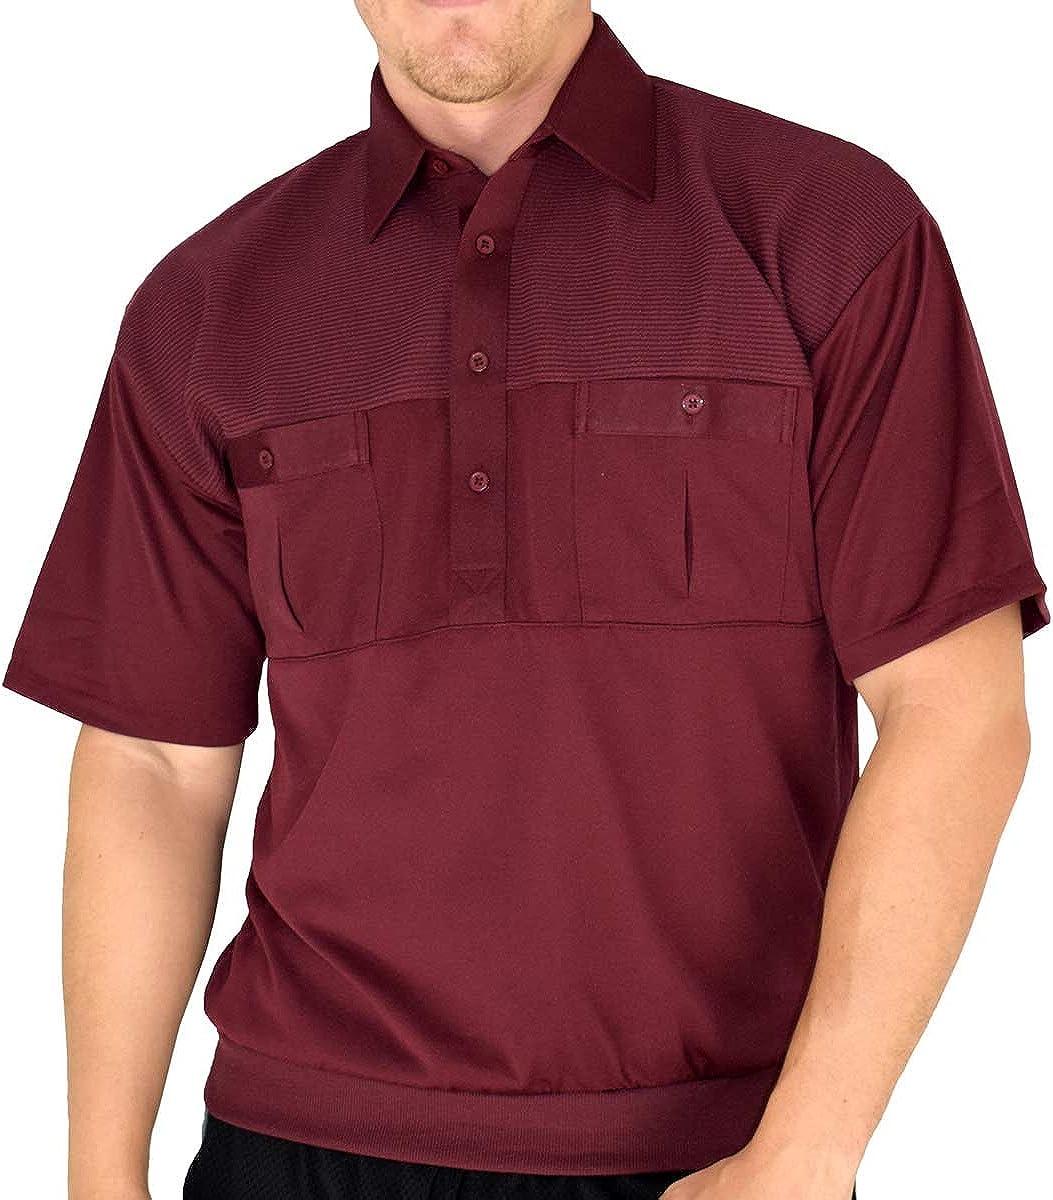 Palmland Classic 2 Pocket Solid Banded Bottom Polo Shirt Big and Tall (4XLT, Burgundy)